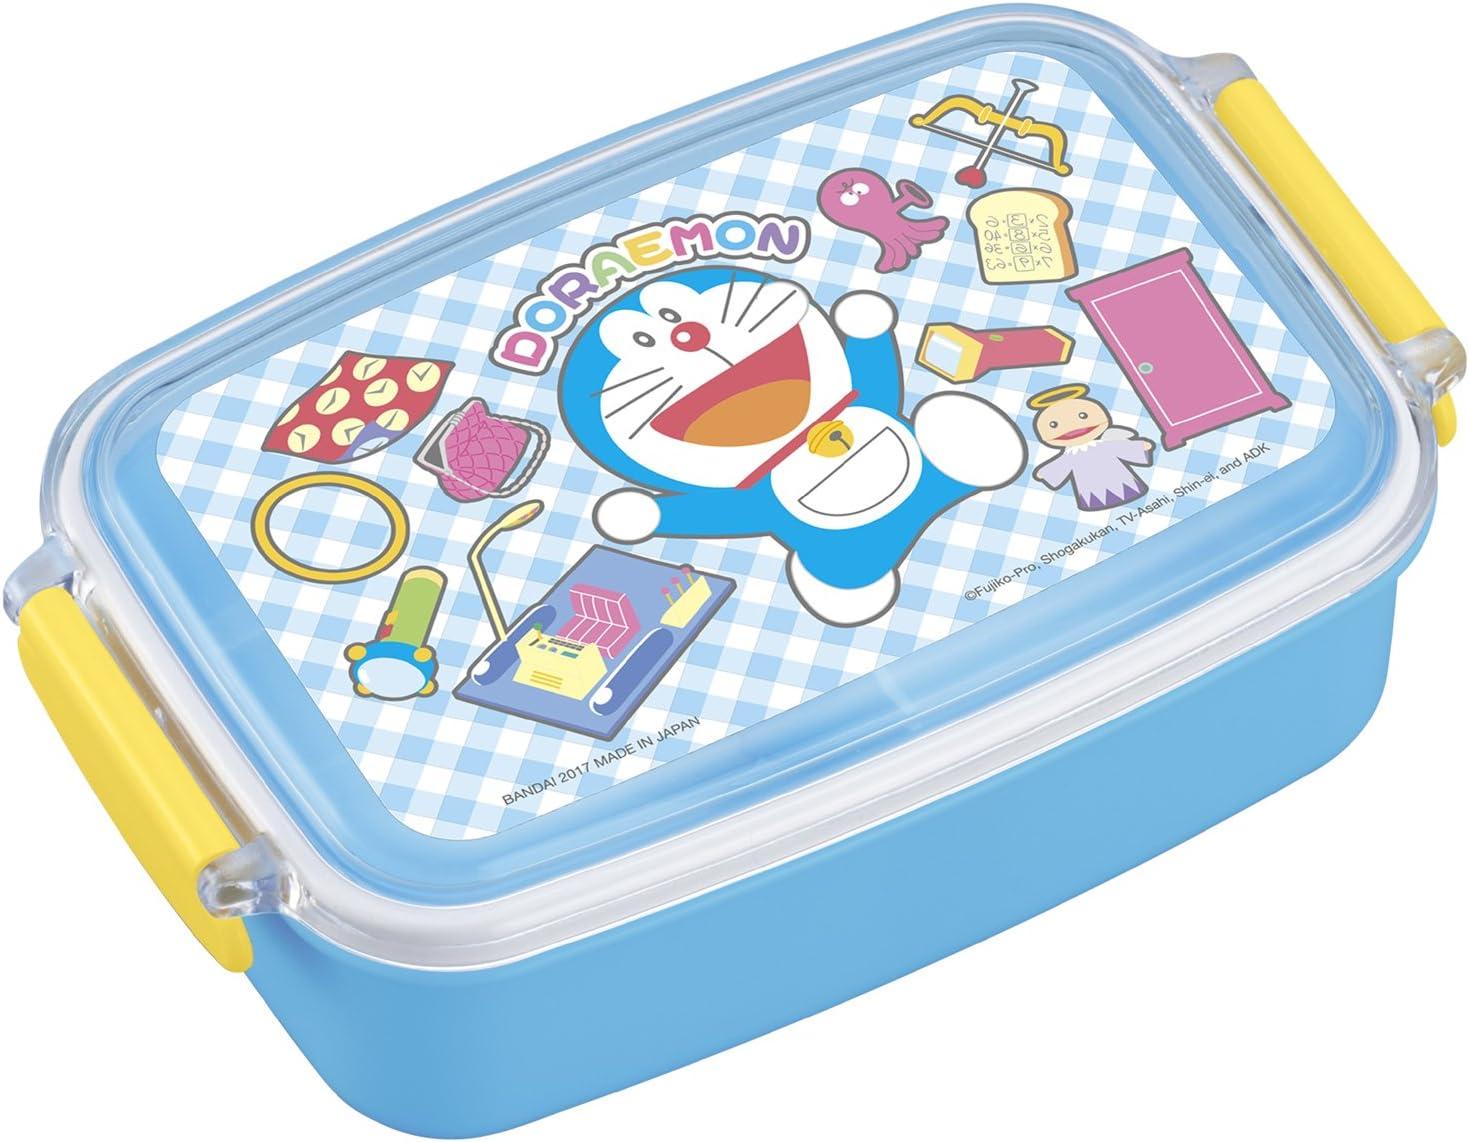 500 ml OSK o-esuke Doraemon Doraemon Fiambrera con Tapa